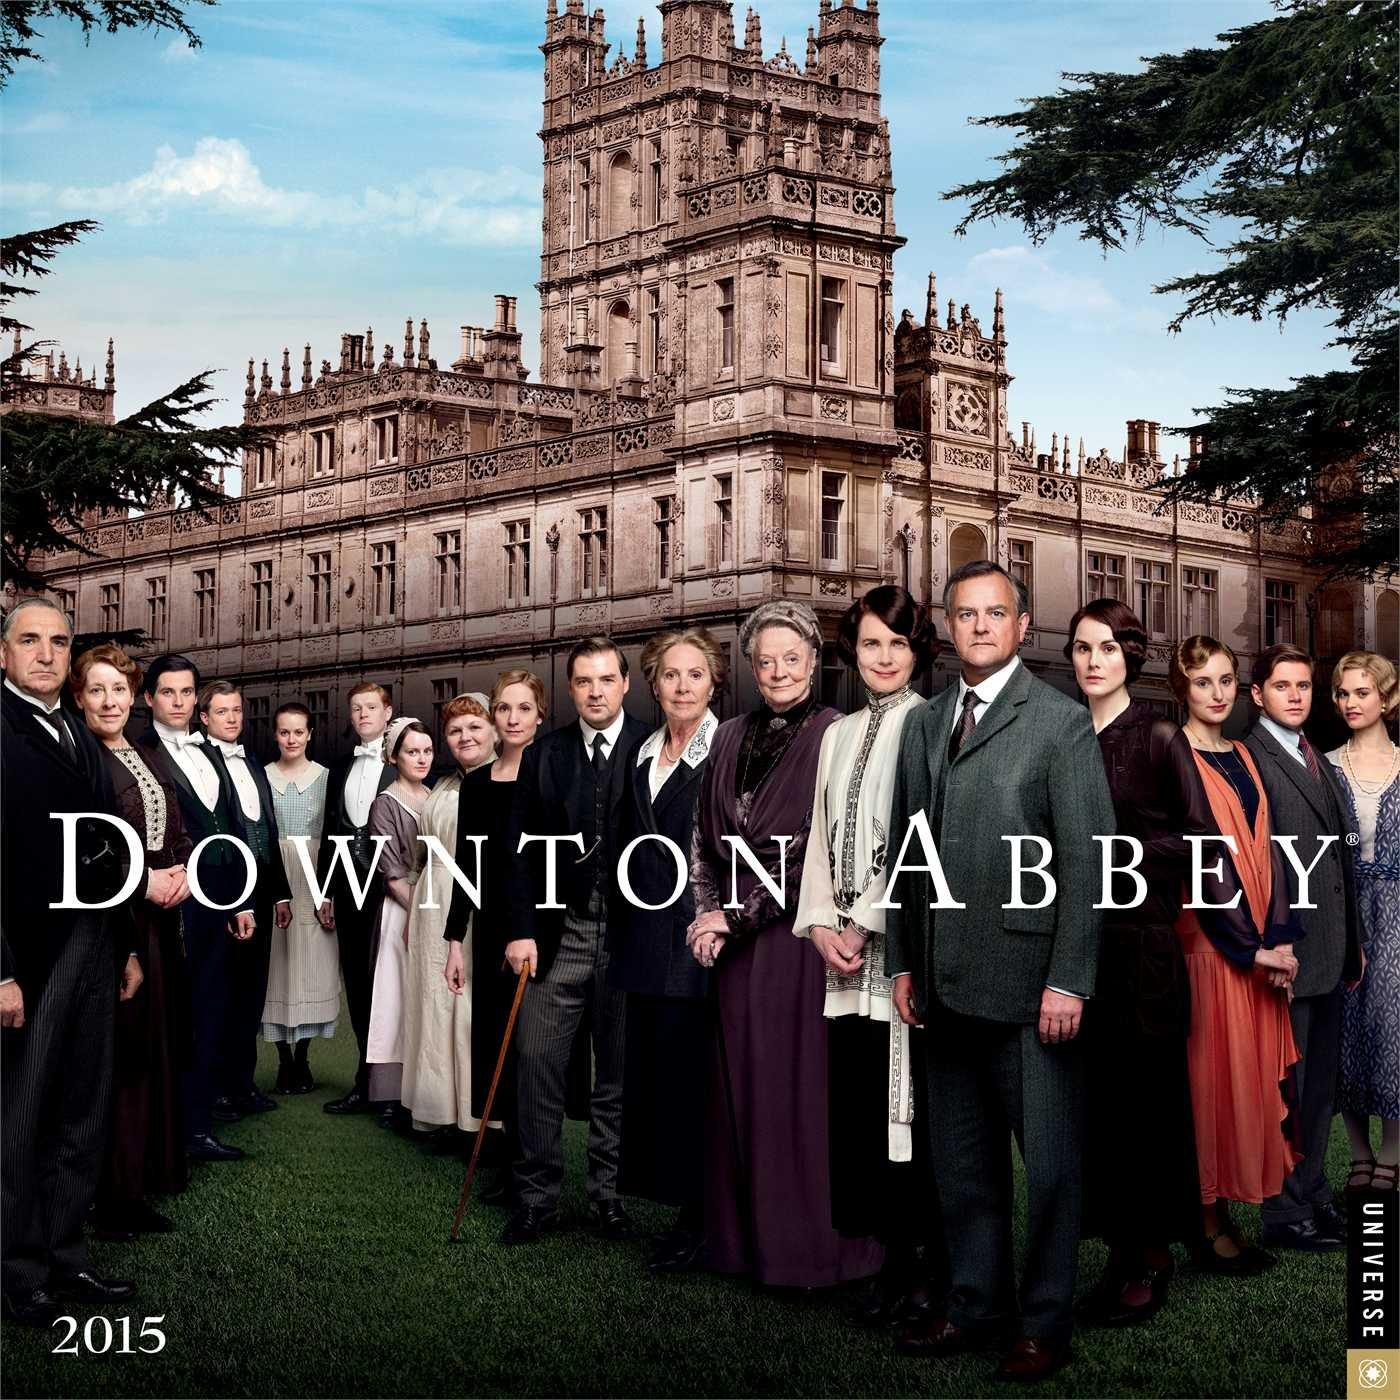 Downton Abbey 2015 Wall Calendar